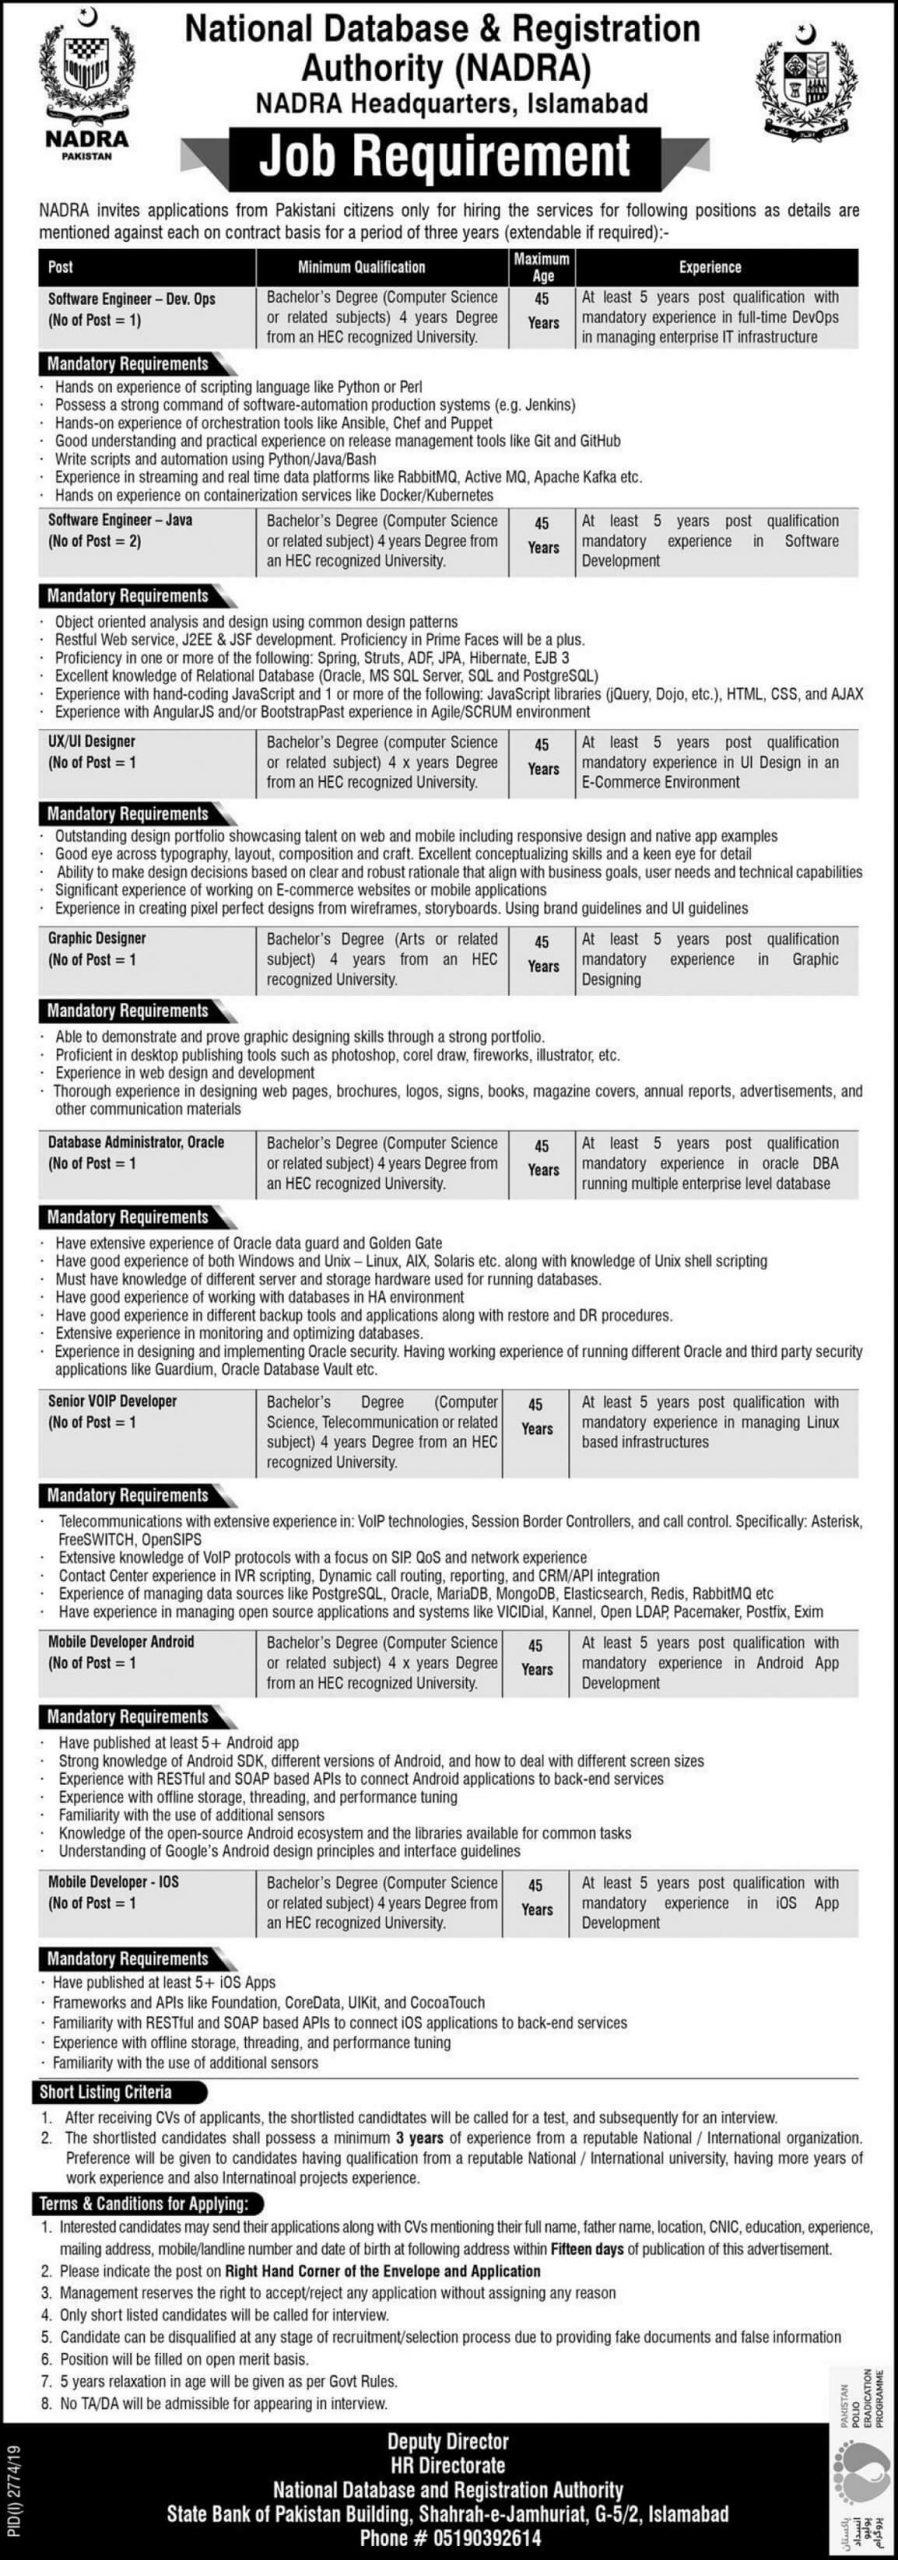 NADRA-Headquarters-Islamabad-Jobs-2019